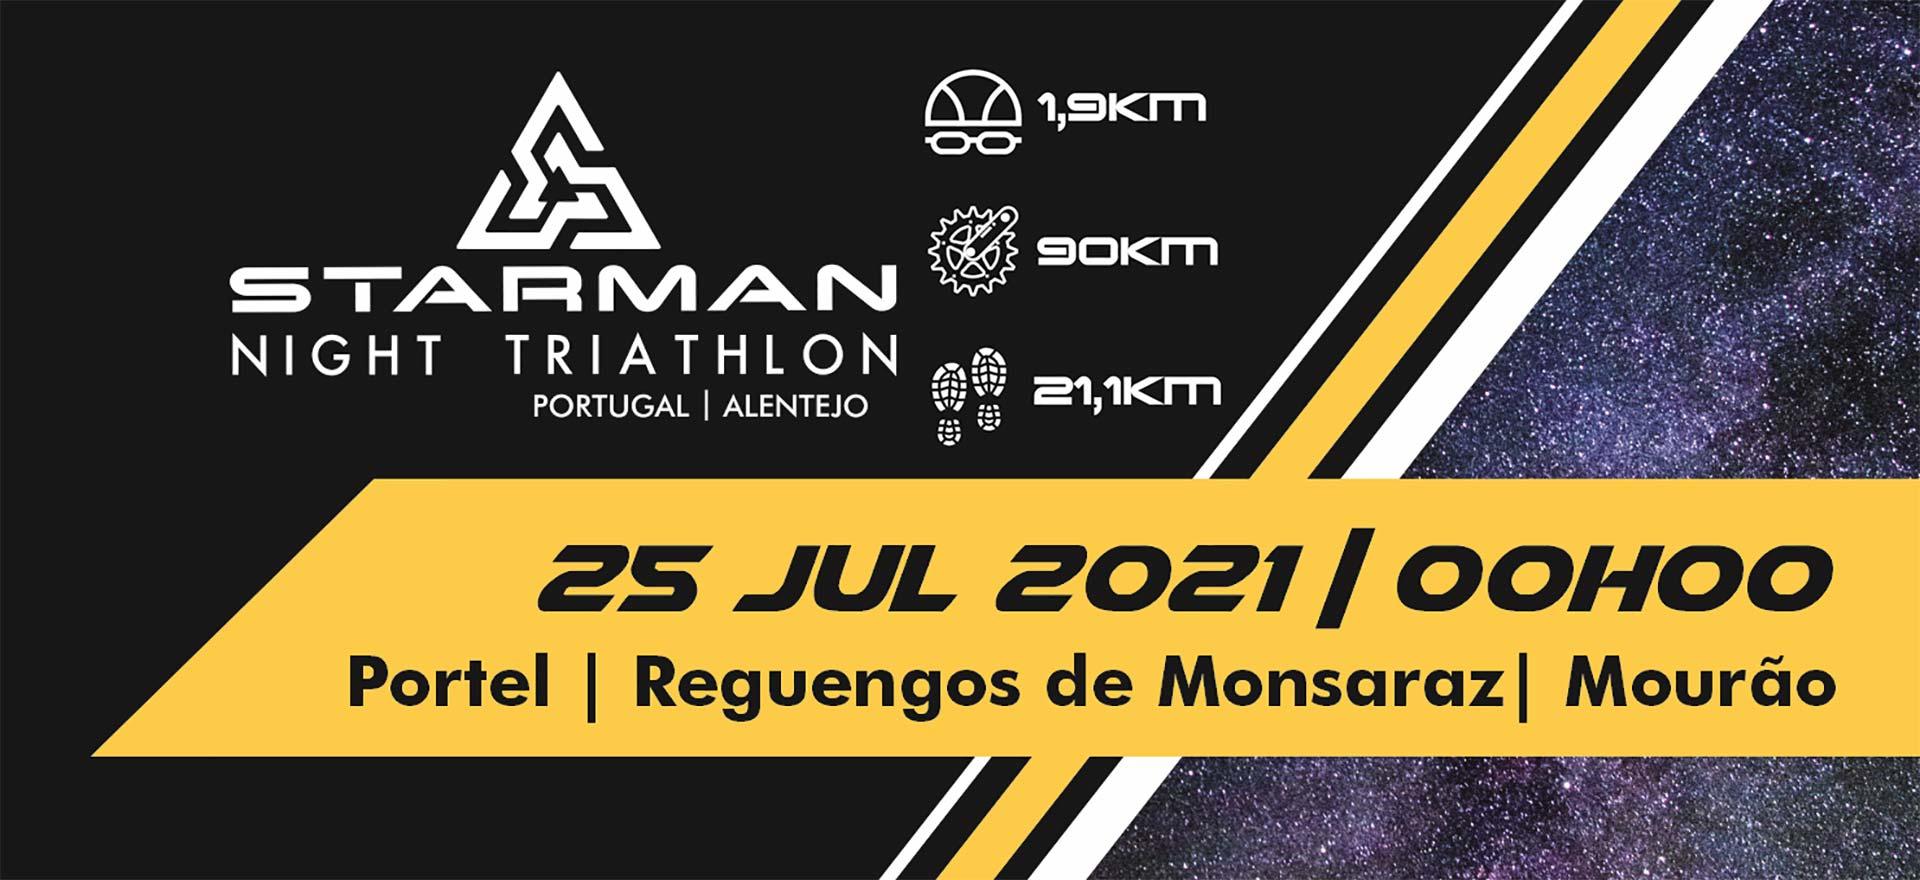 Starman – Night Triathlon a 25/07/2021